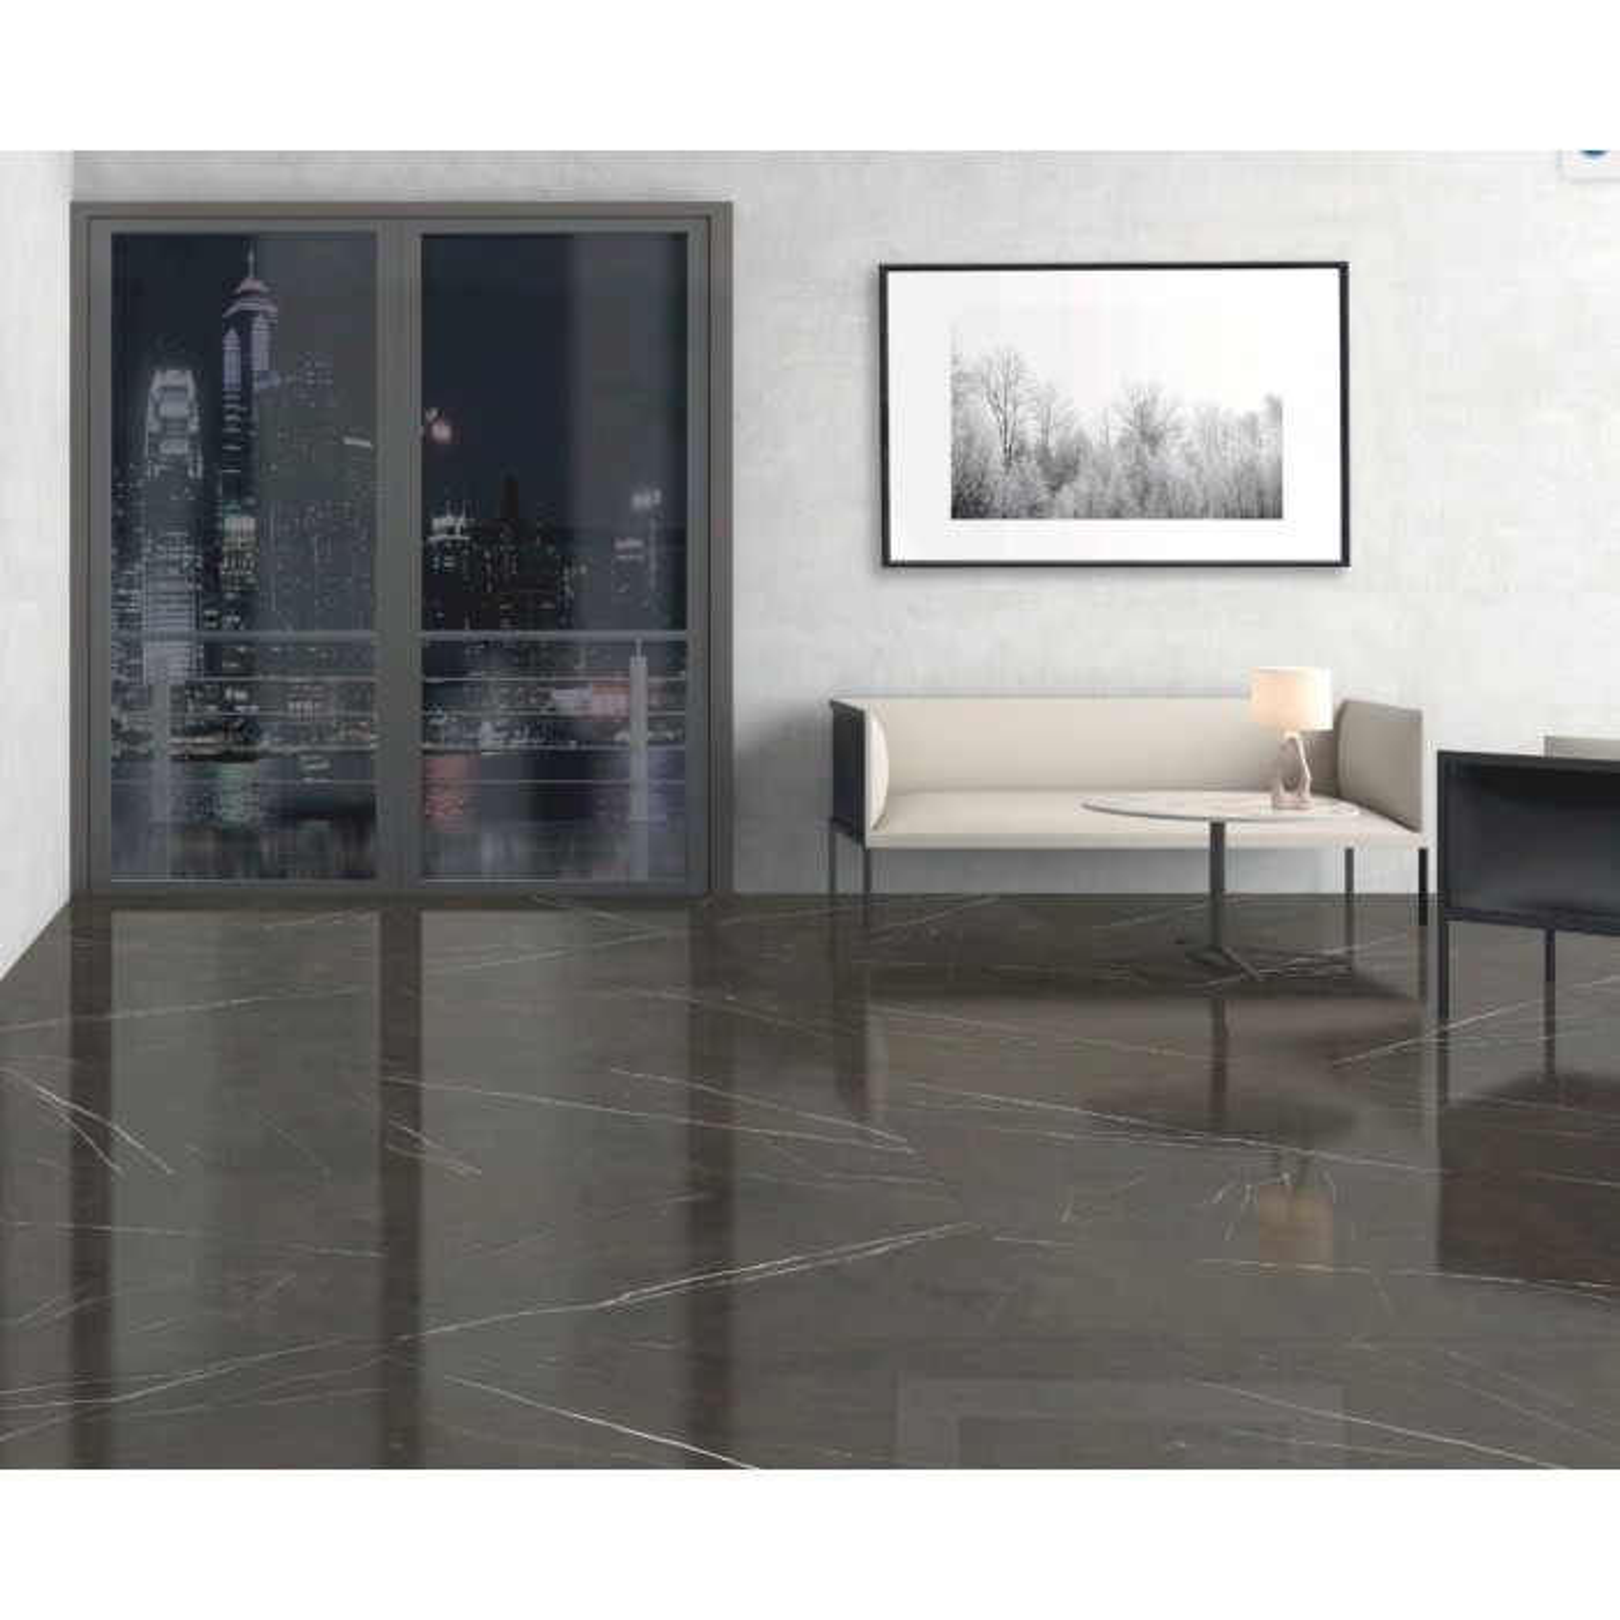 carrelage gr s c rame effet marbre pietra grey gris chaud 1 couleur rectifi casalux home. Black Bedroom Furniture Sets. Home Design Ideas